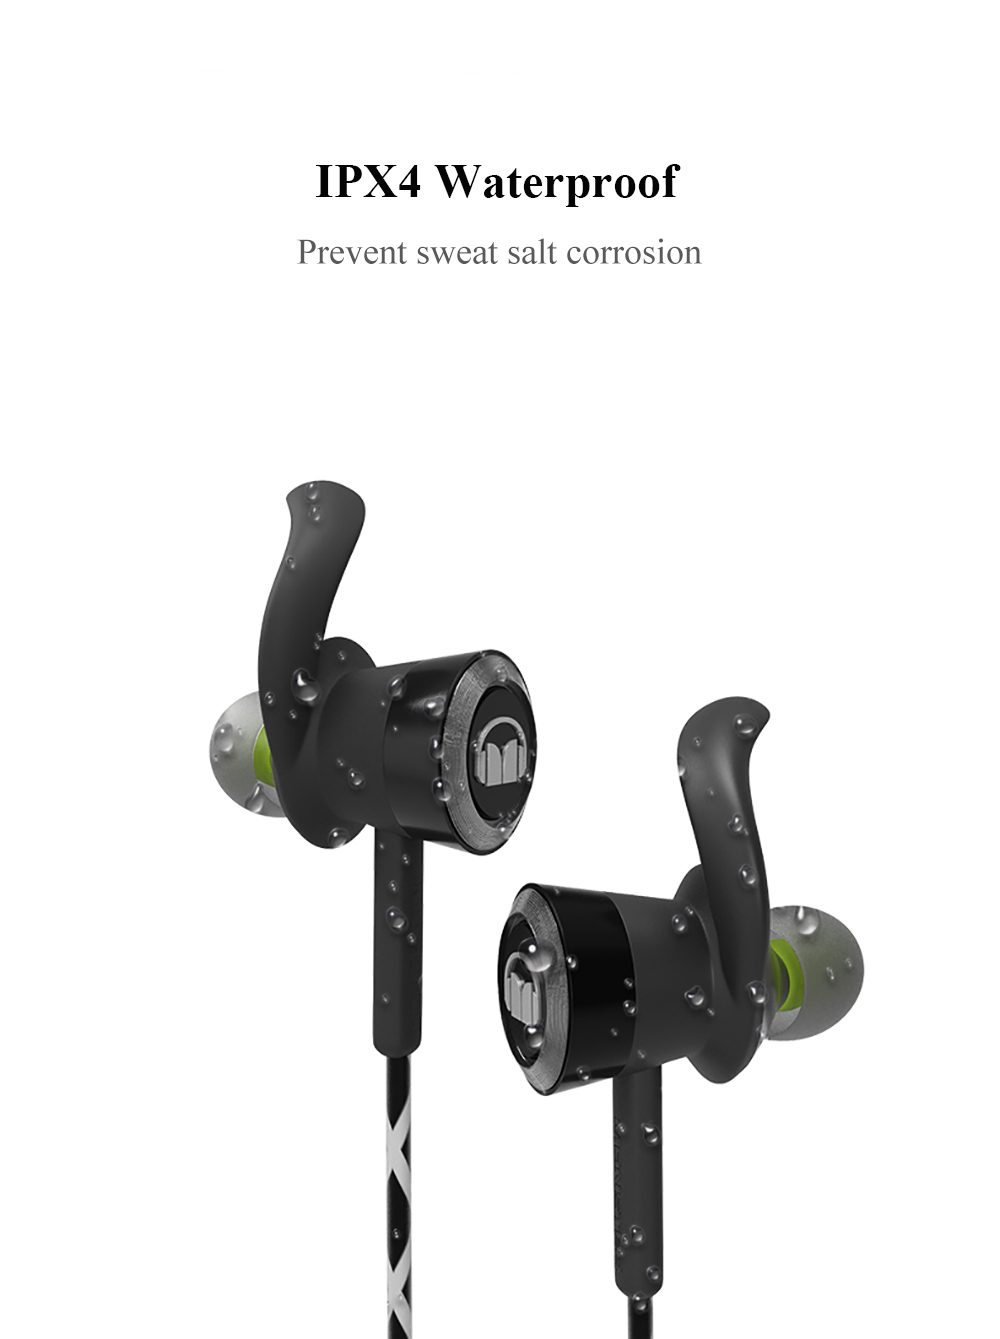 Mic Correndo IPX4 Fio Reflexivo À Prova D' Água